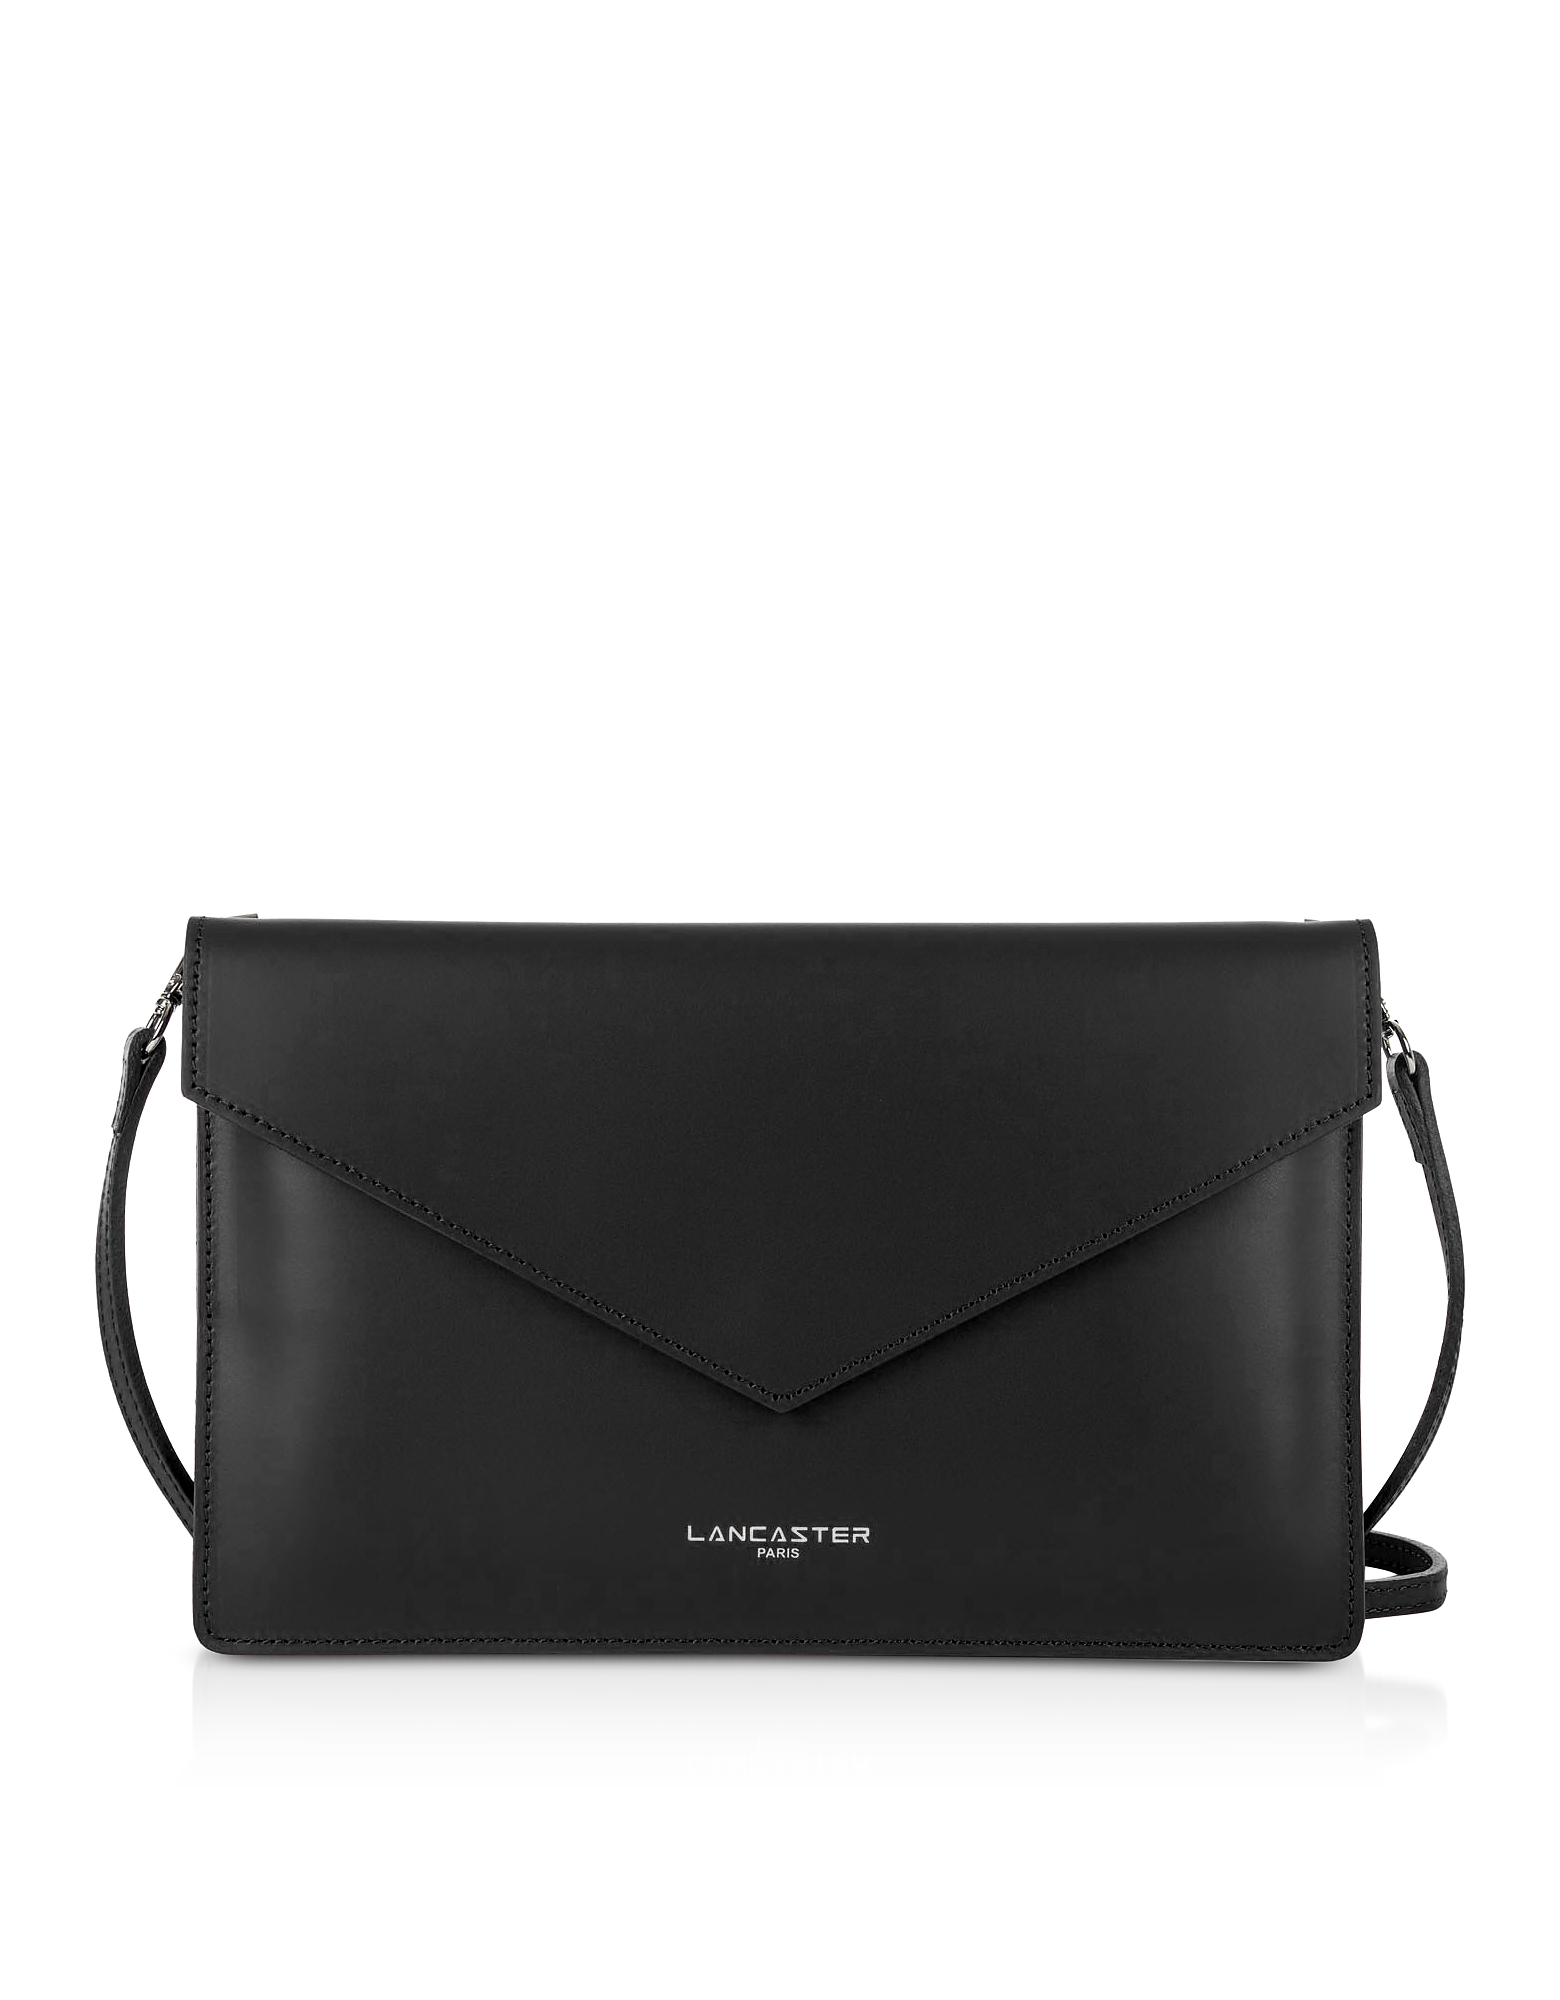 Lancaster Paris Designer Handbags, Pur & Elements Smooth Air 8